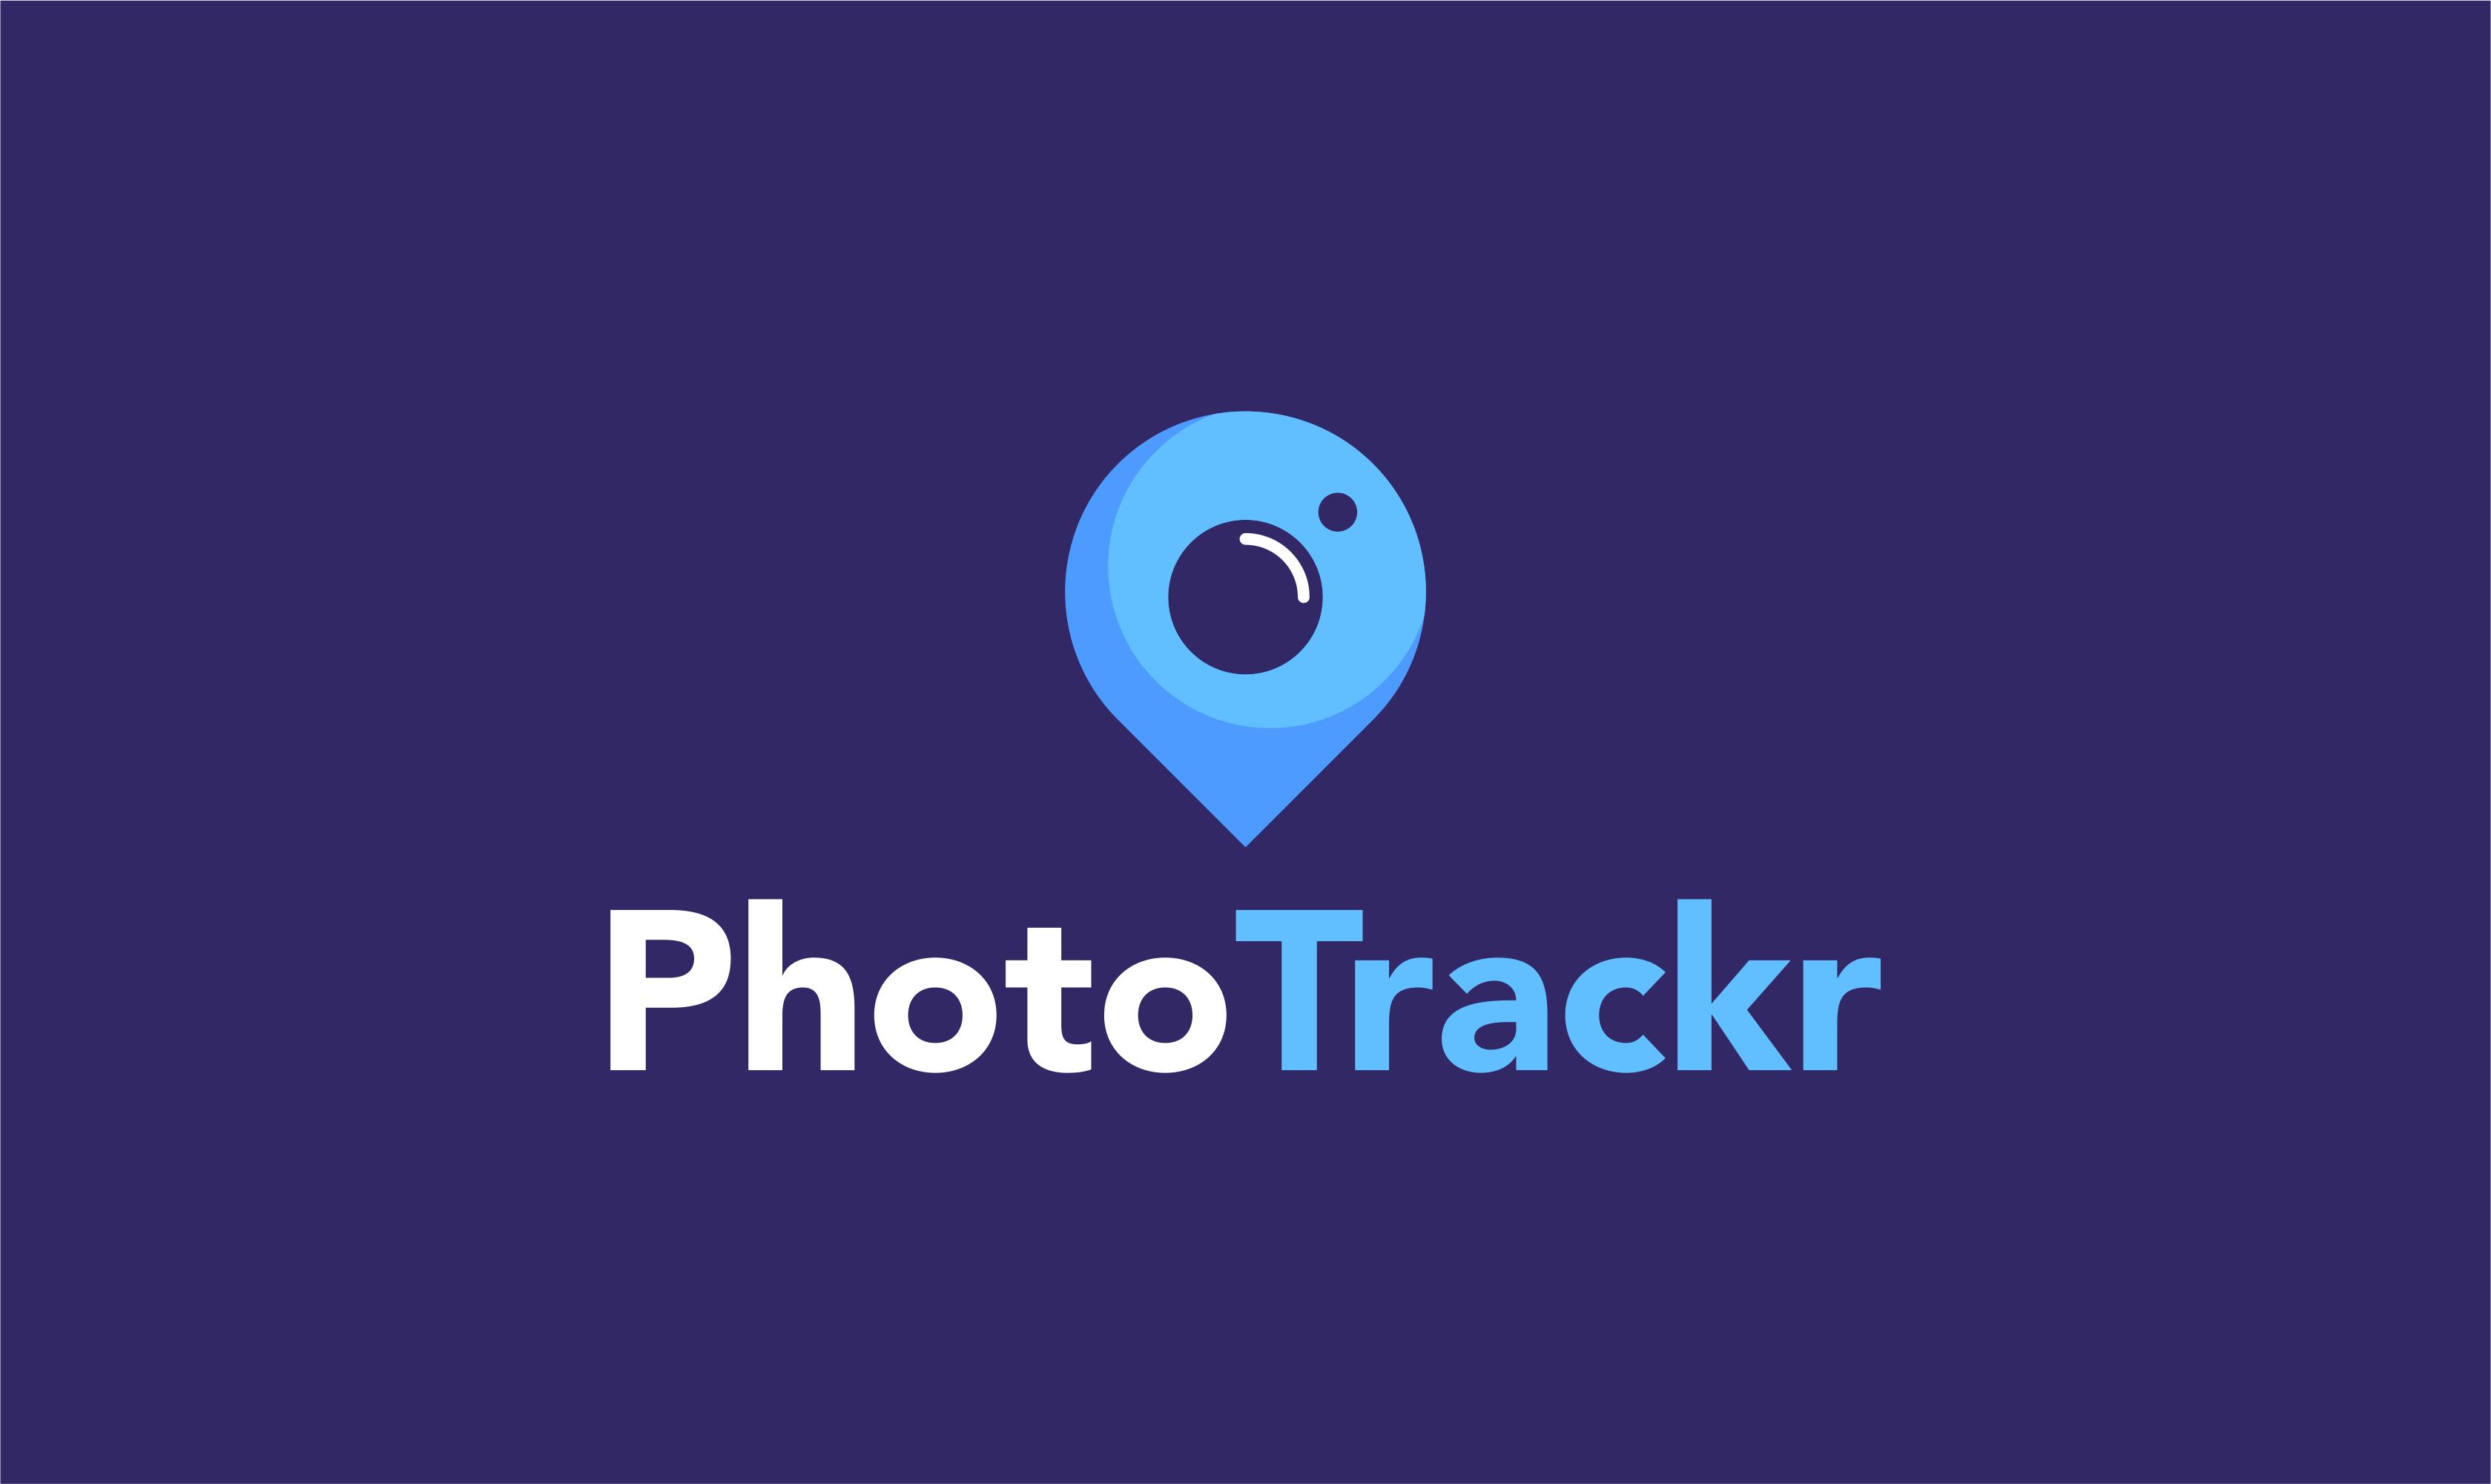 PhotoTrackr.com - E-commerce brand name for sale